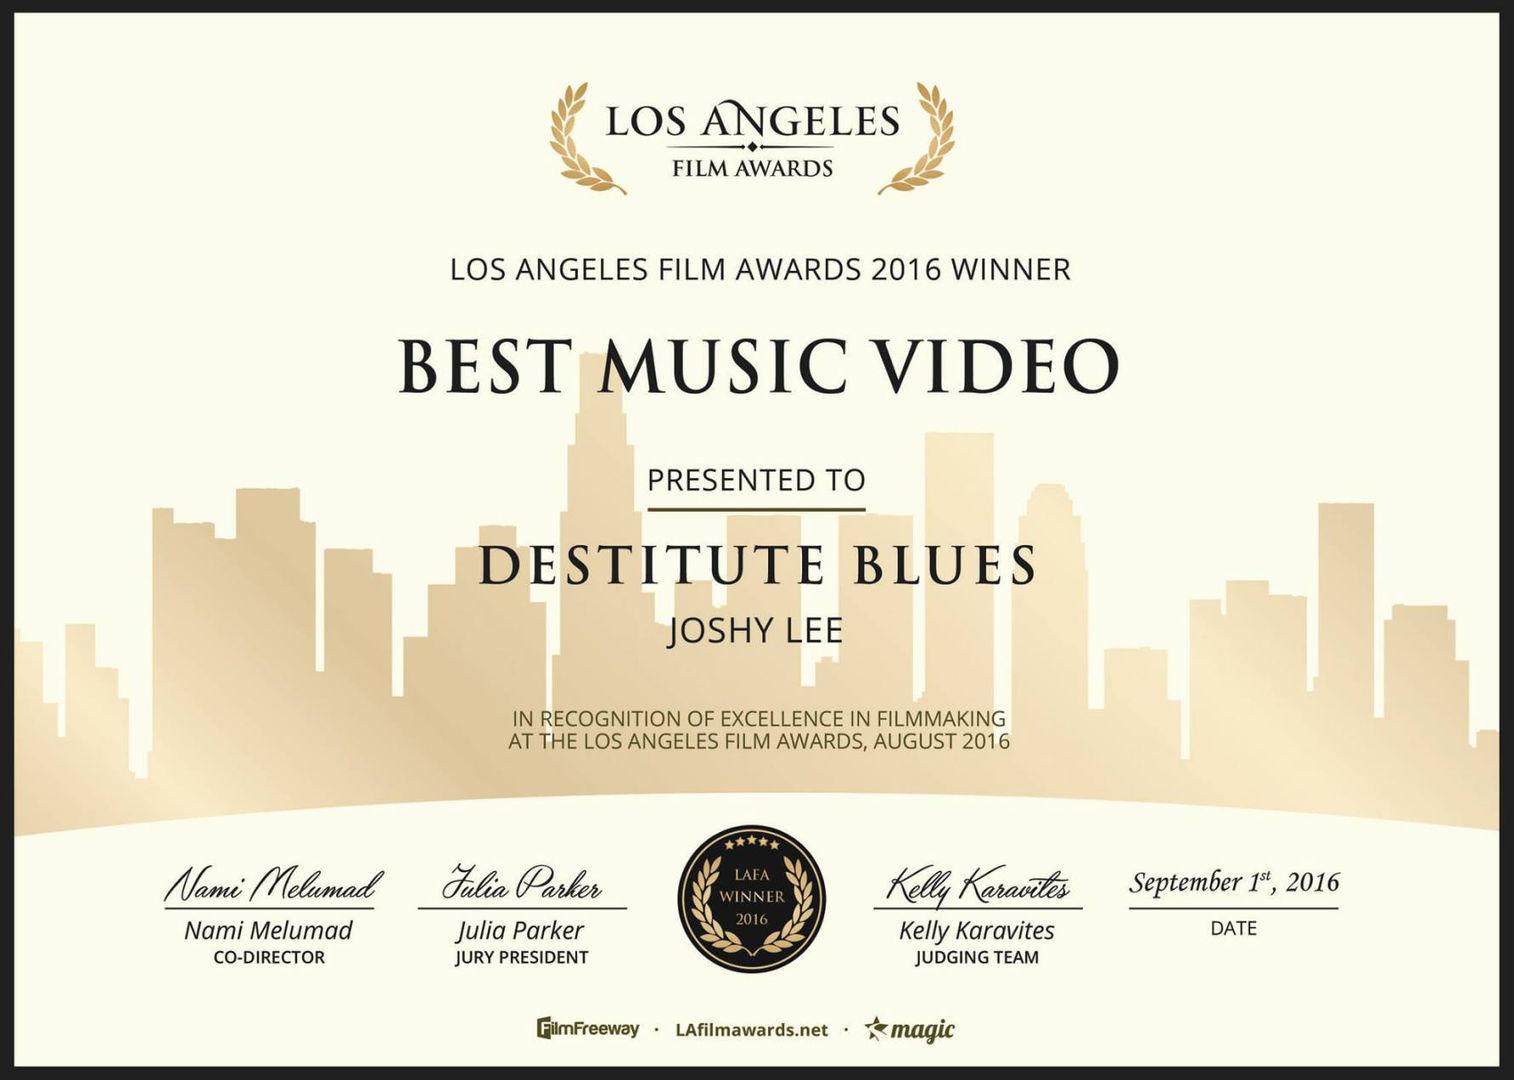 Joshy Lee - Best Music Video for FDC: Destitute Blues